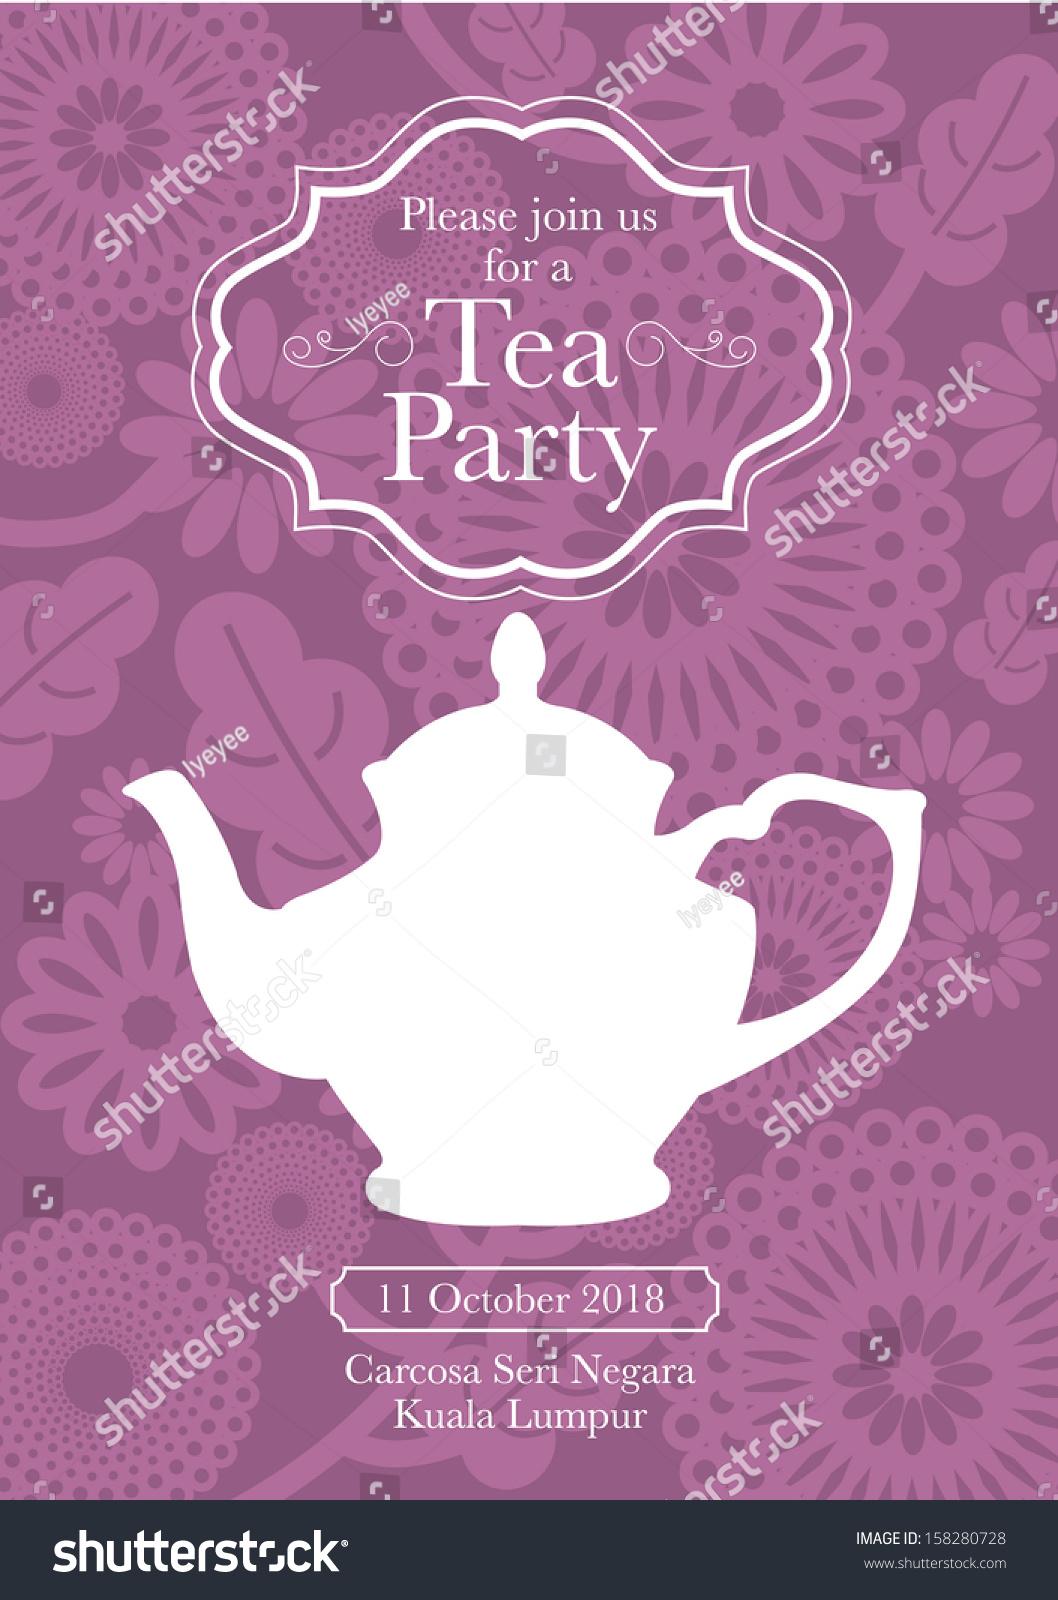 Tea Party Invitation Card Template Vectorillustration Stock Vector ...